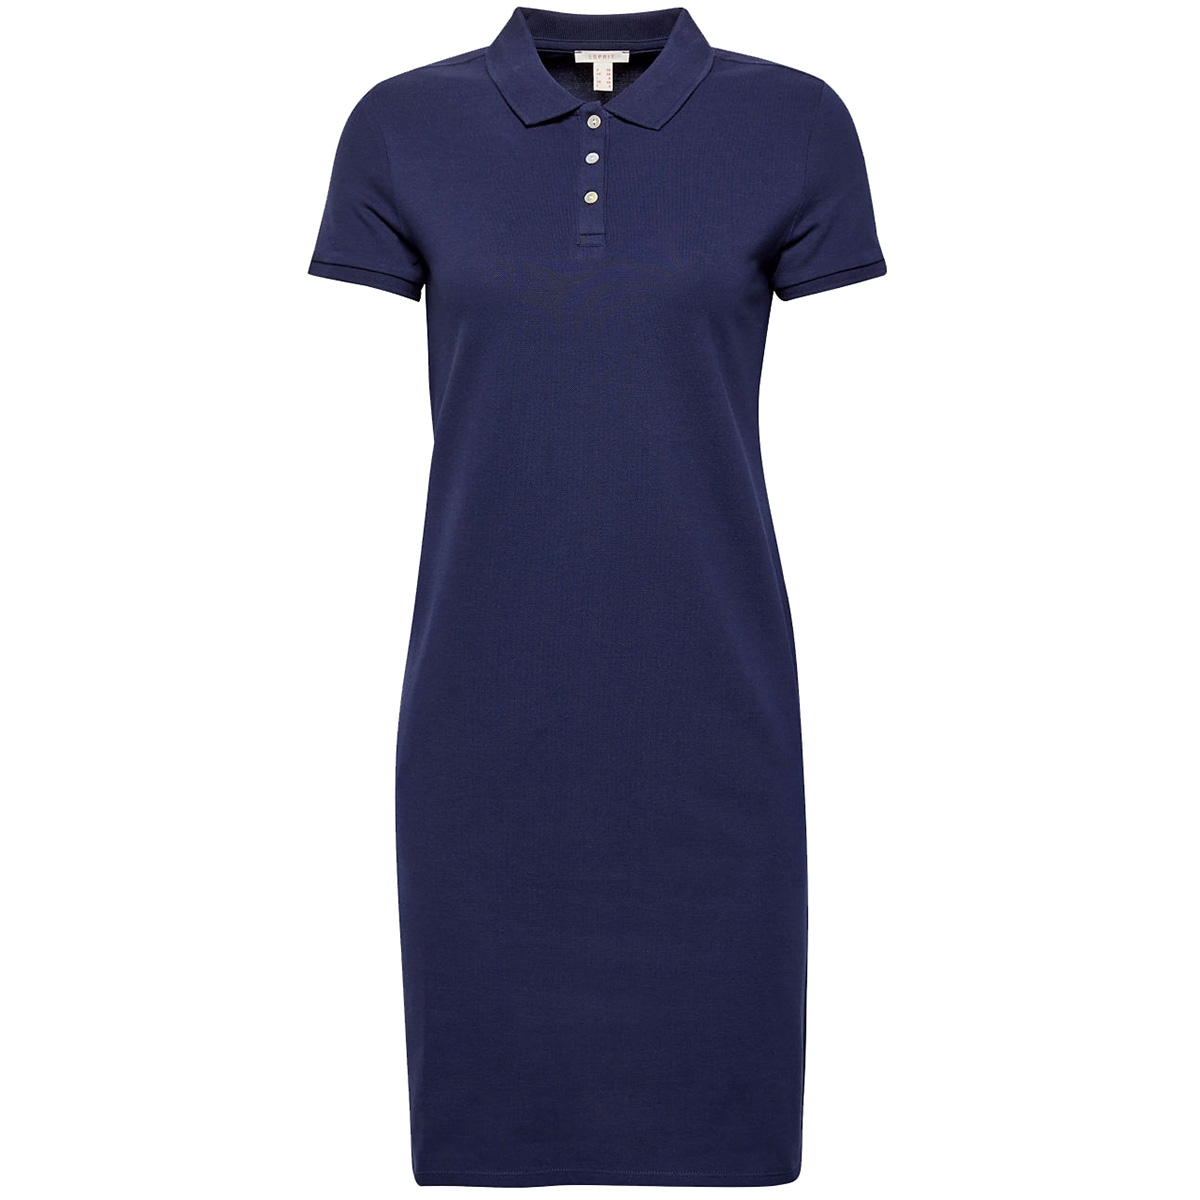 polo dress 039ee1e037 esprit jurk e400